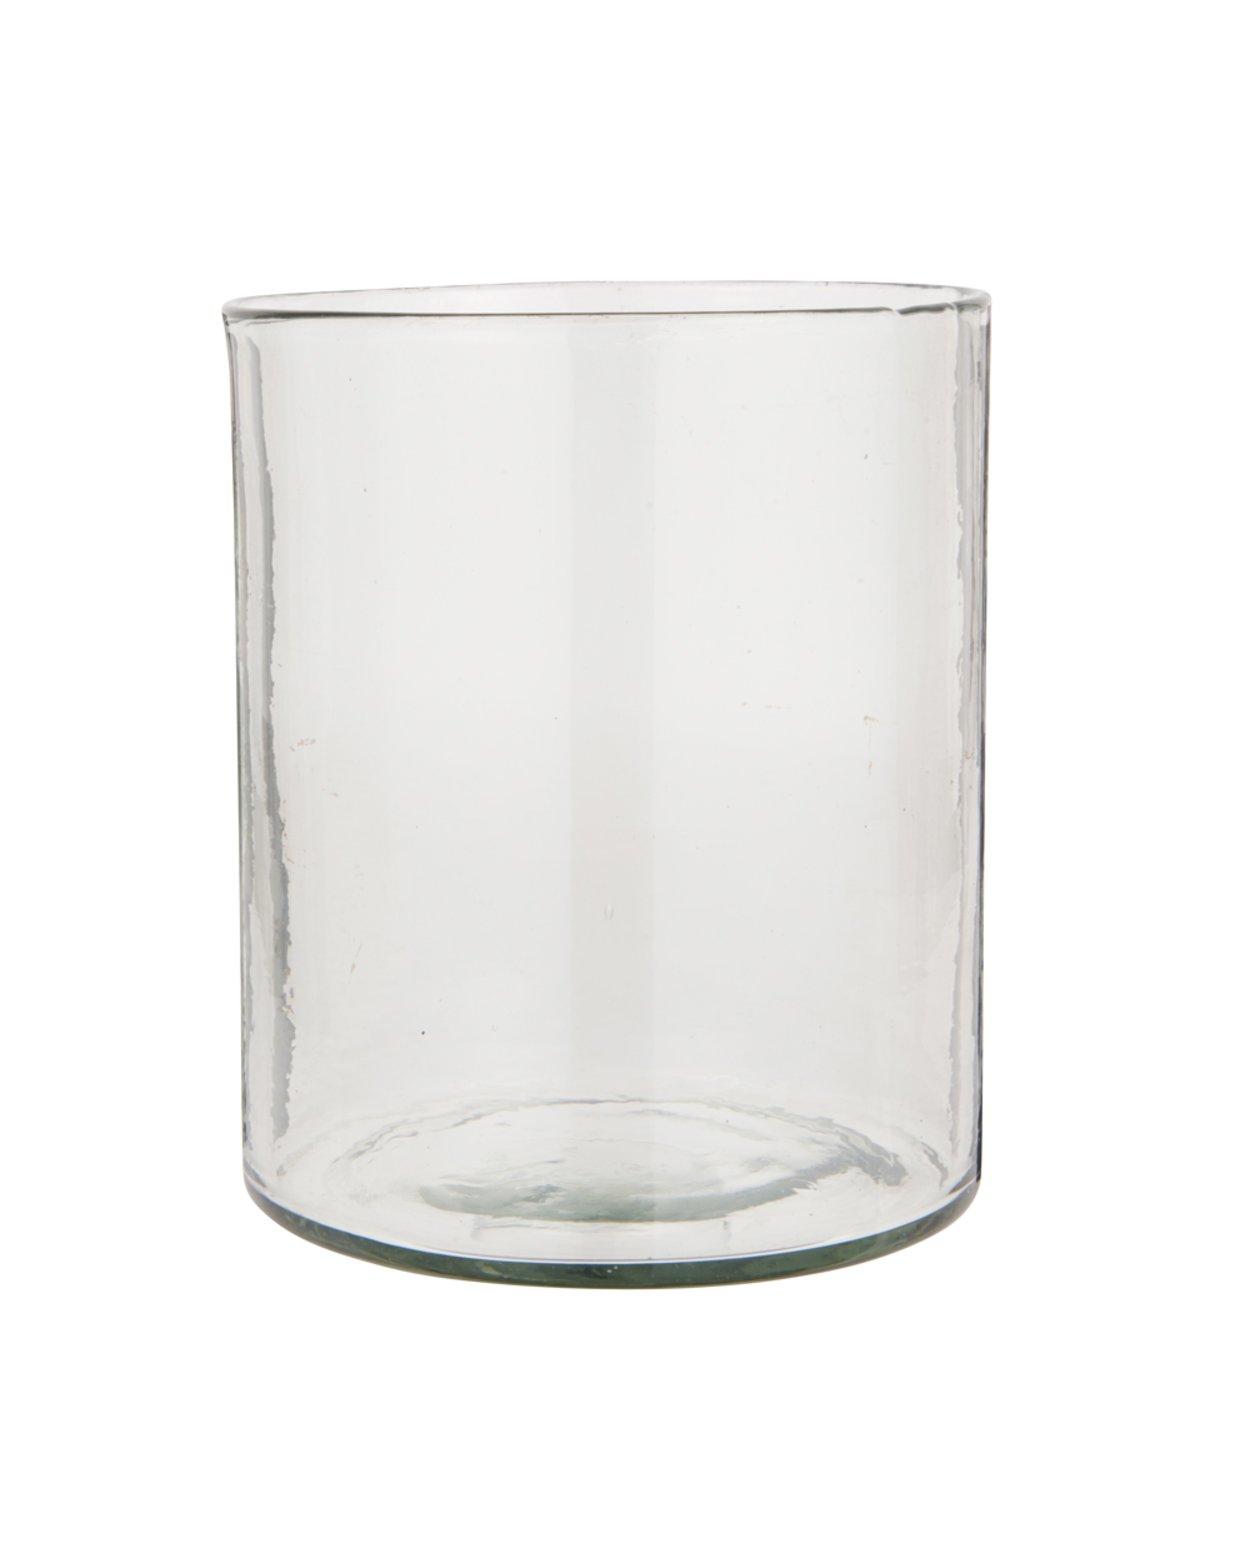 Hurricane Glass Candle Holder - 23cm